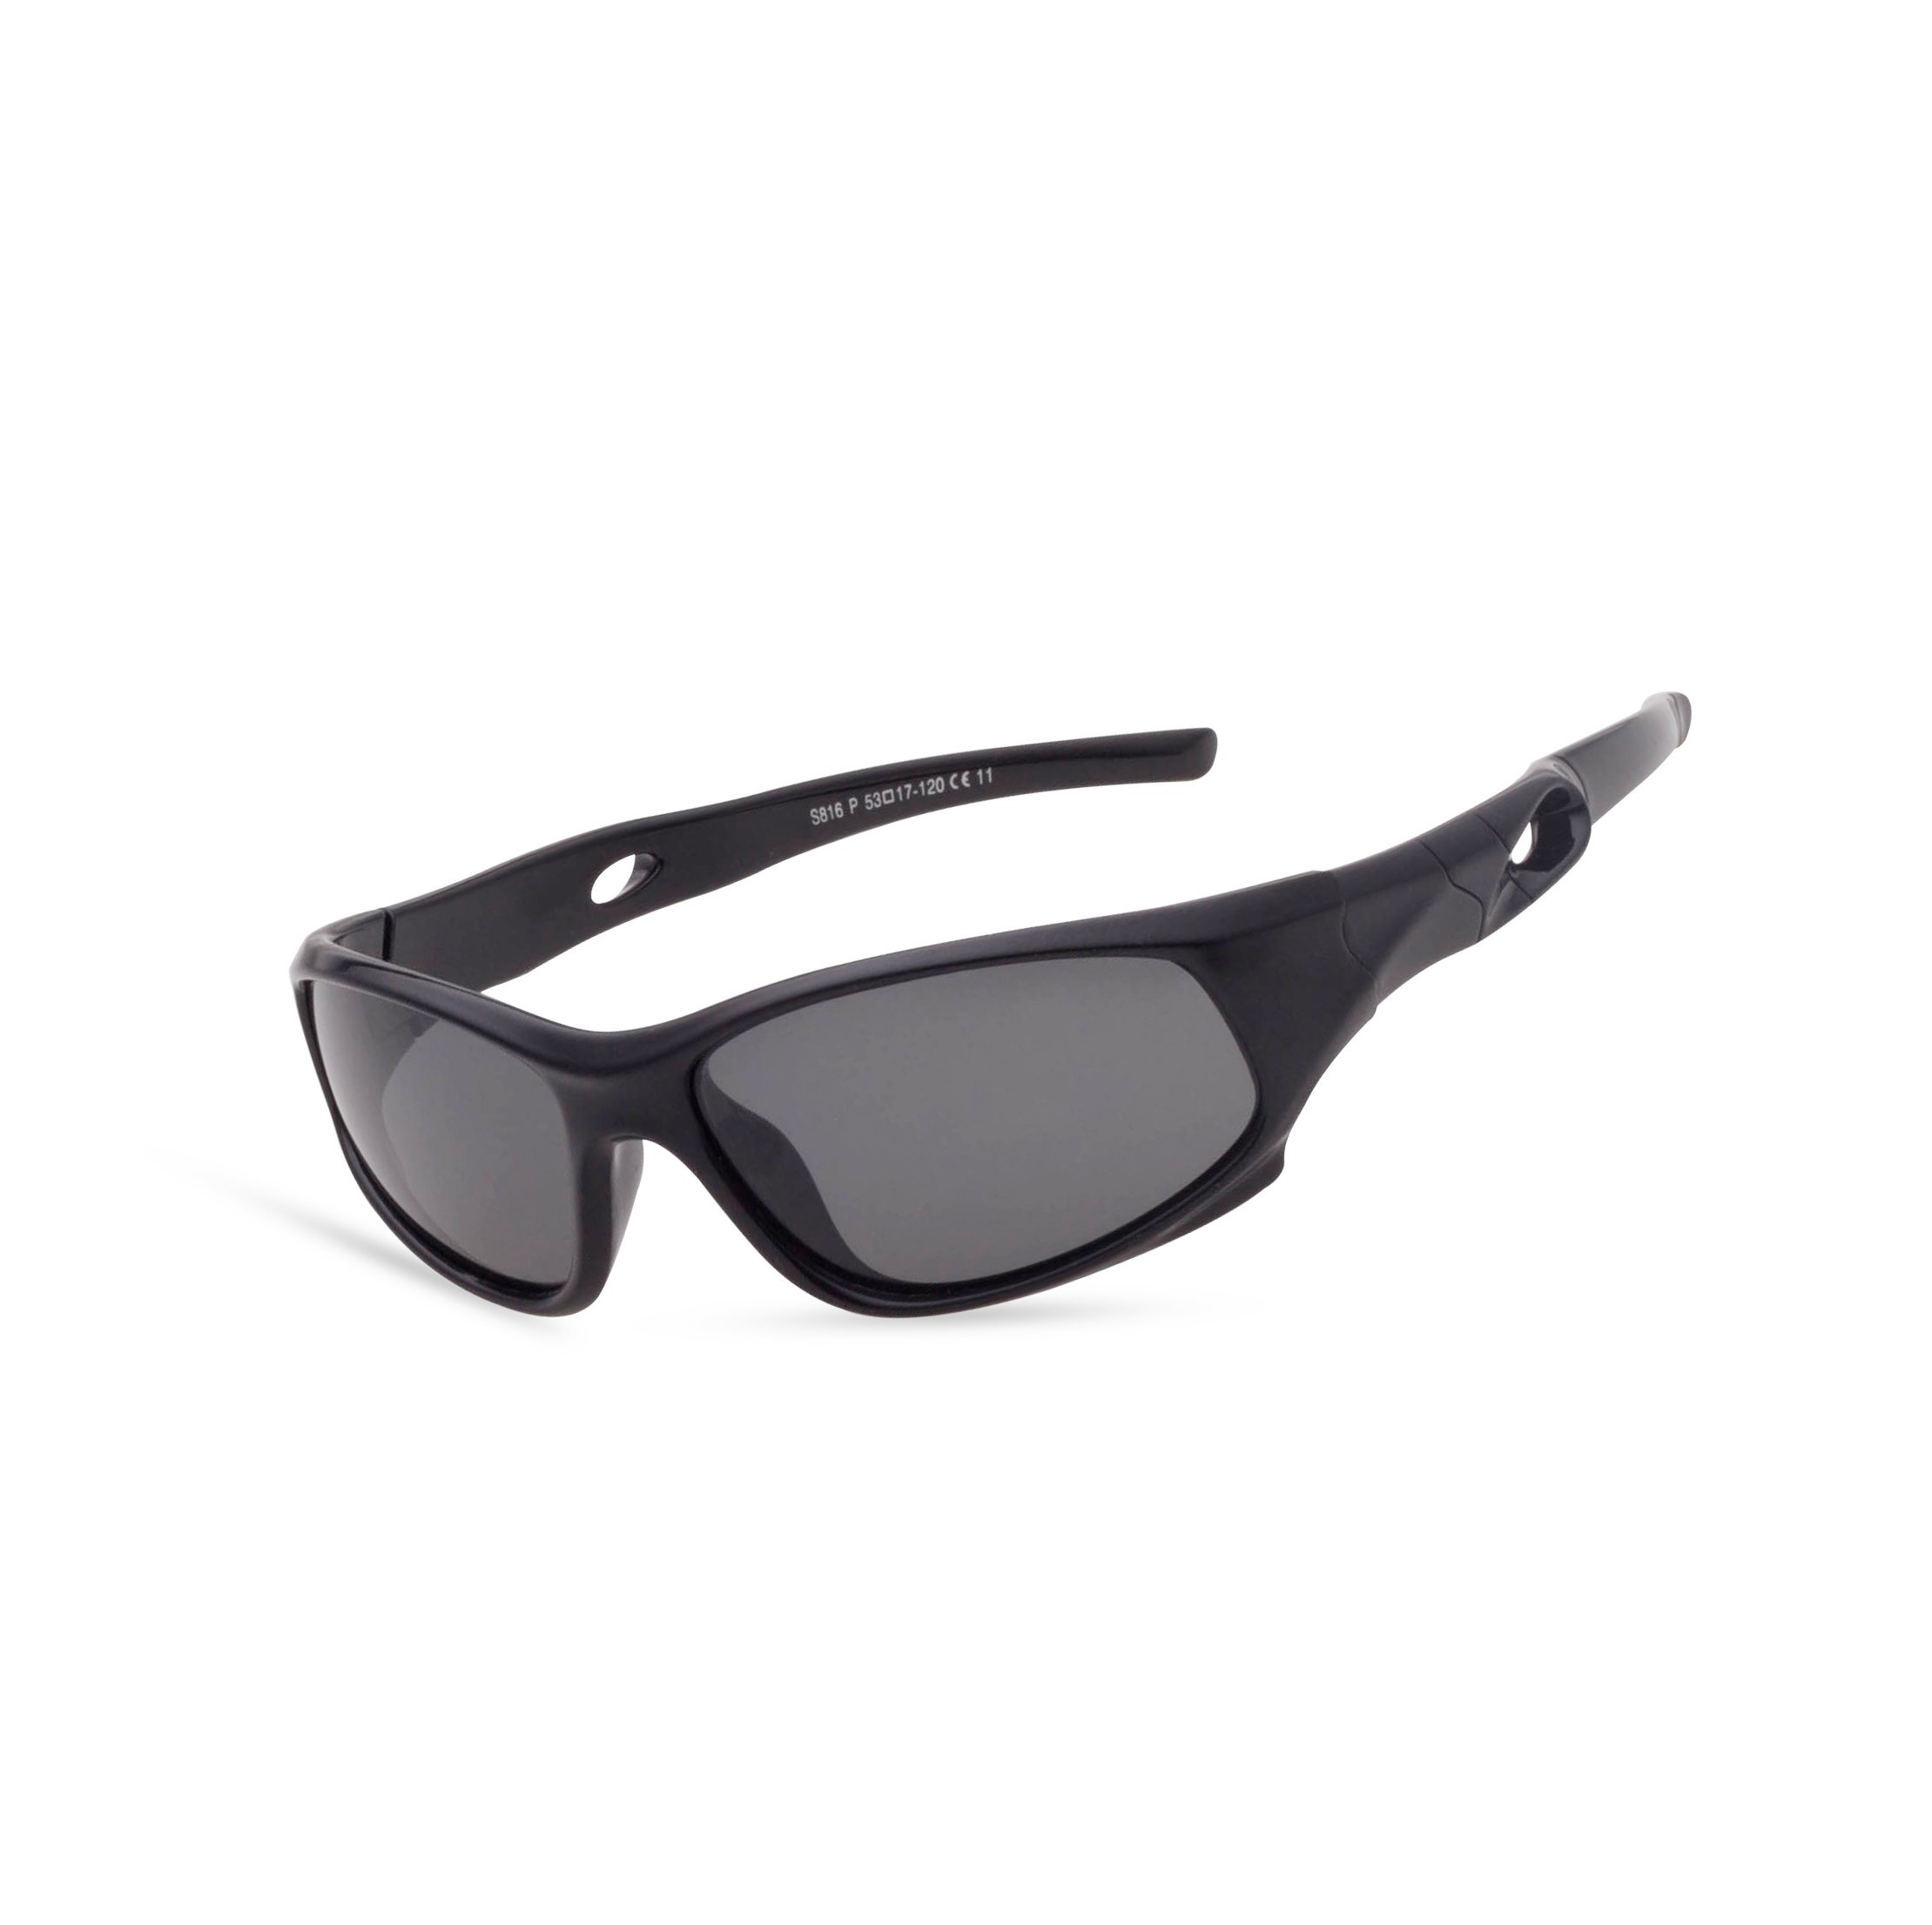 Tacloft TR90 Kids Polarized Sunglasses 53MM Children Sunglasses Wayfarer S816P Black